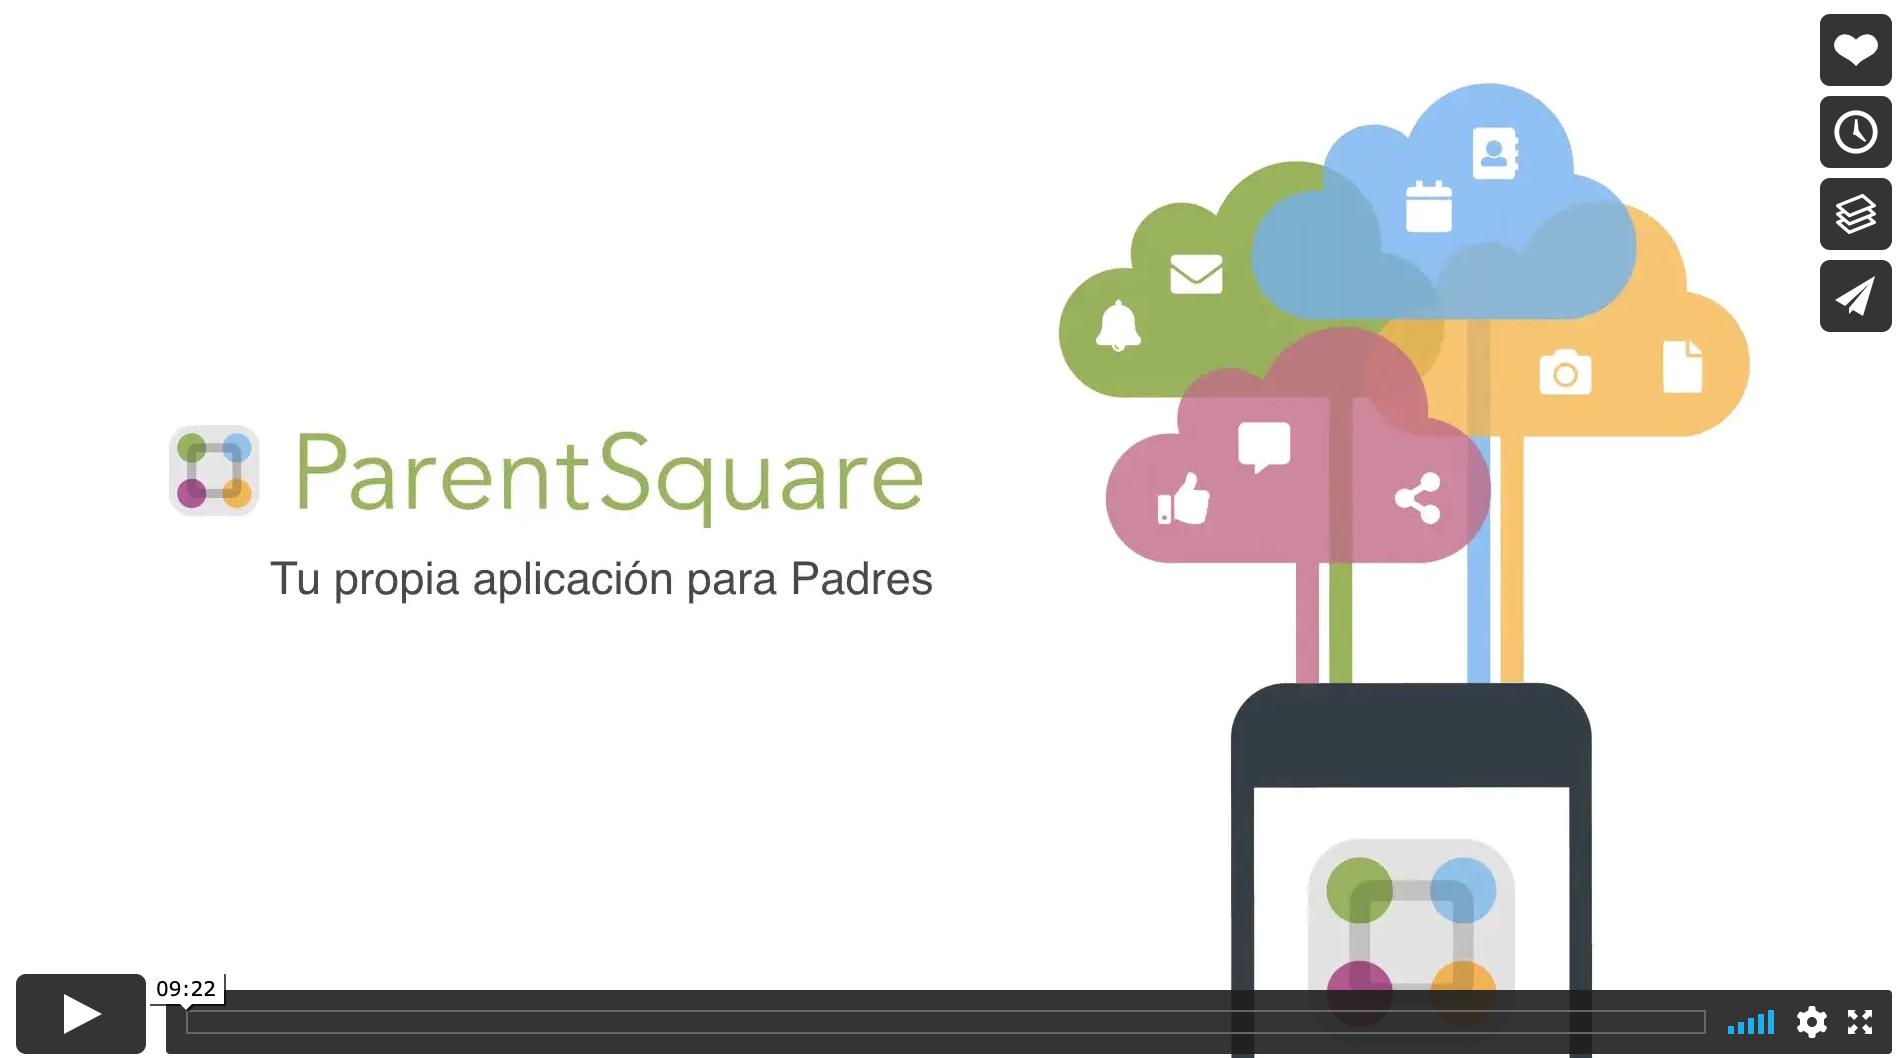 ParentSquare App Click for Spanish Video